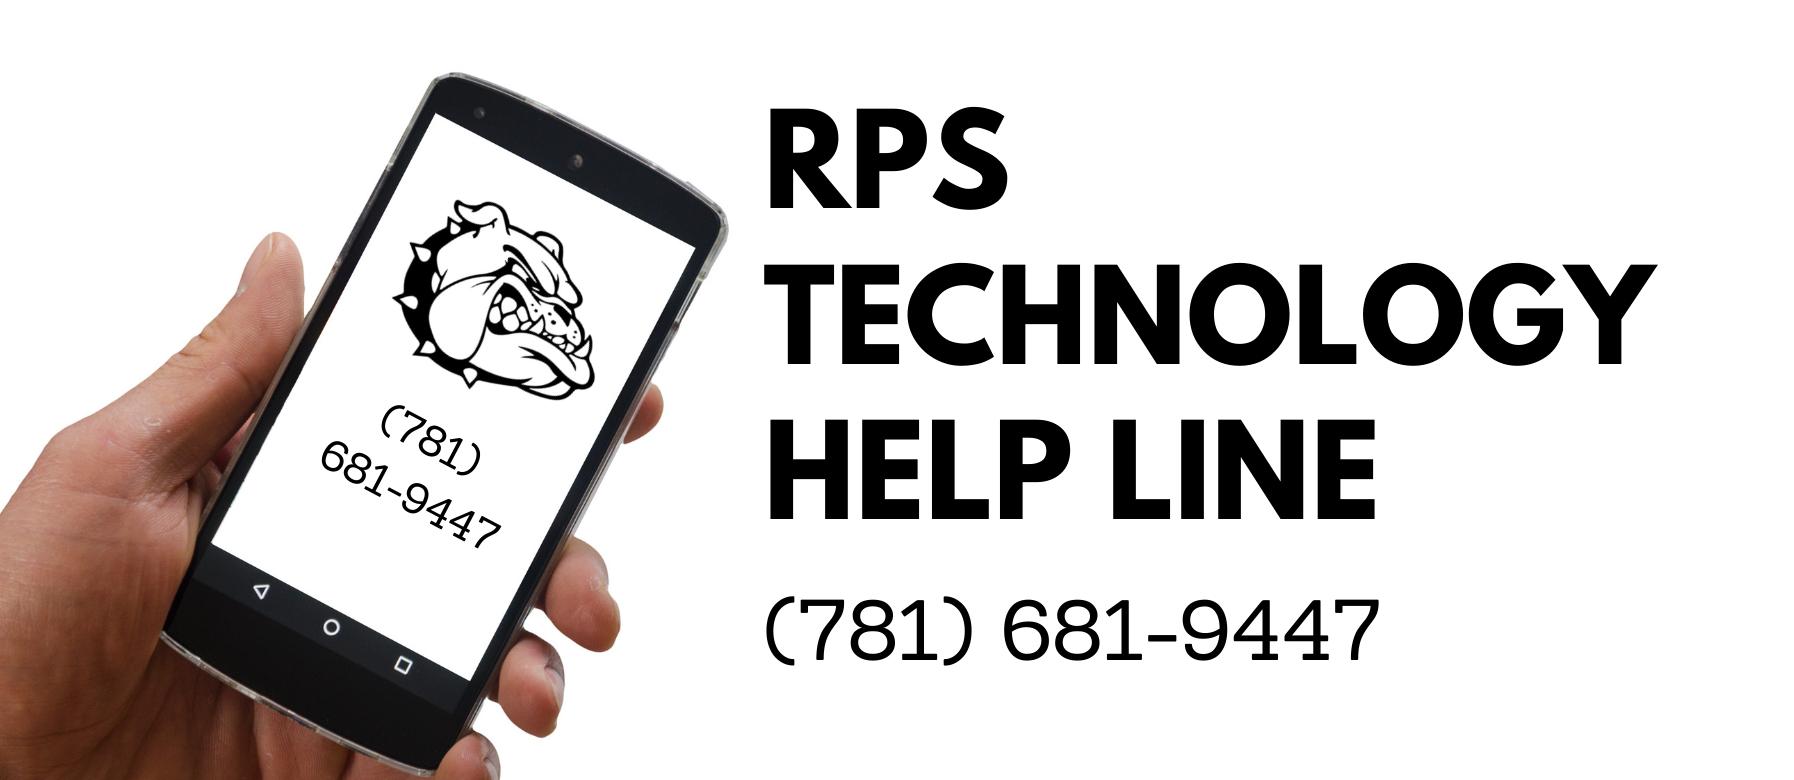 RPS Technology Help Line